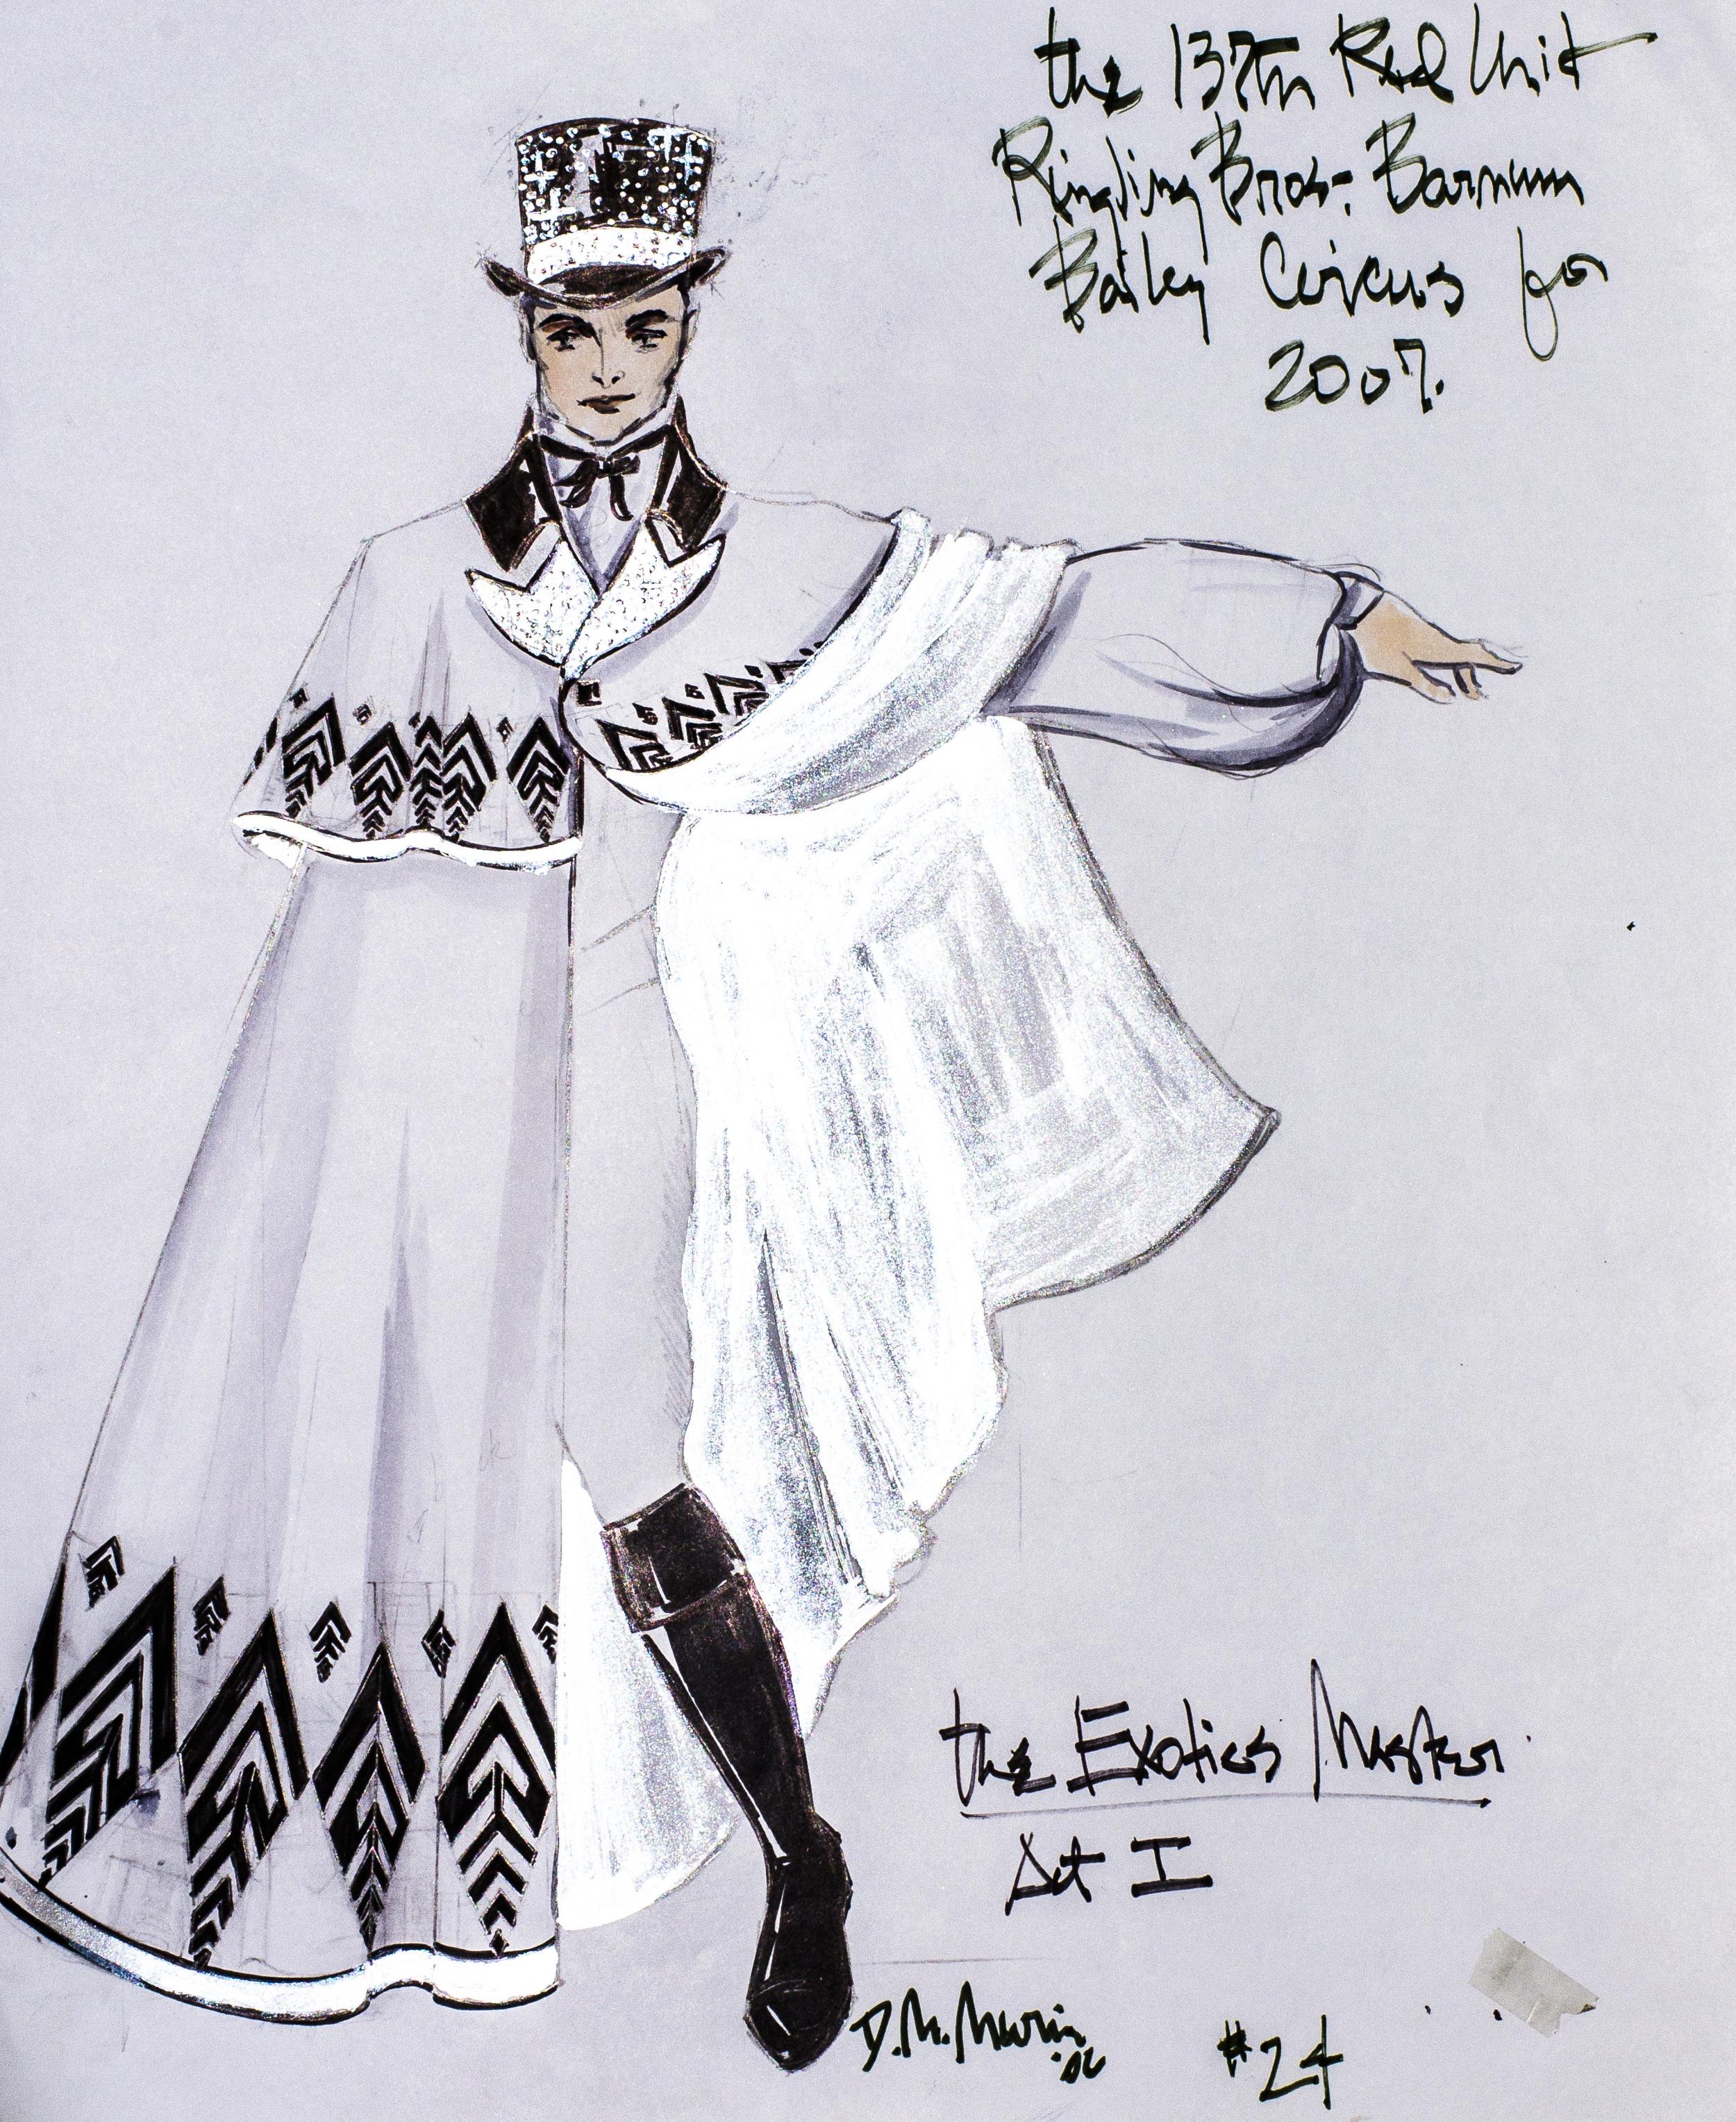 exotics master white.jpg